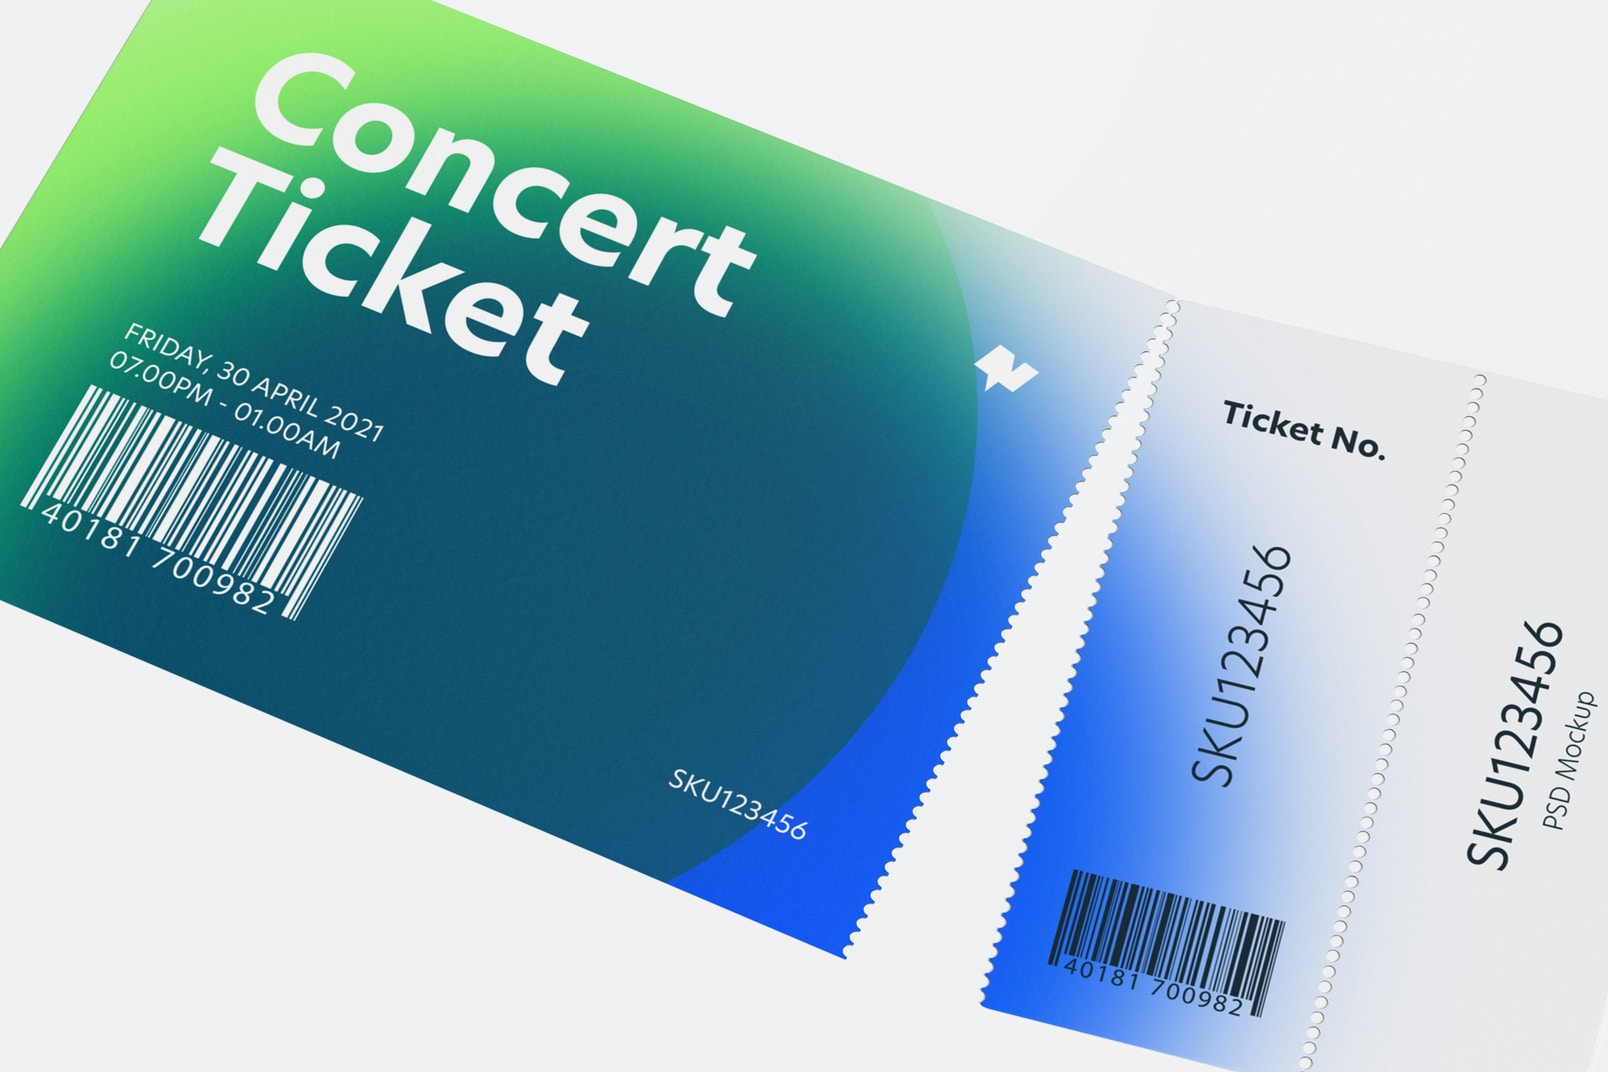 Concert Ticket Mockup, Close Up